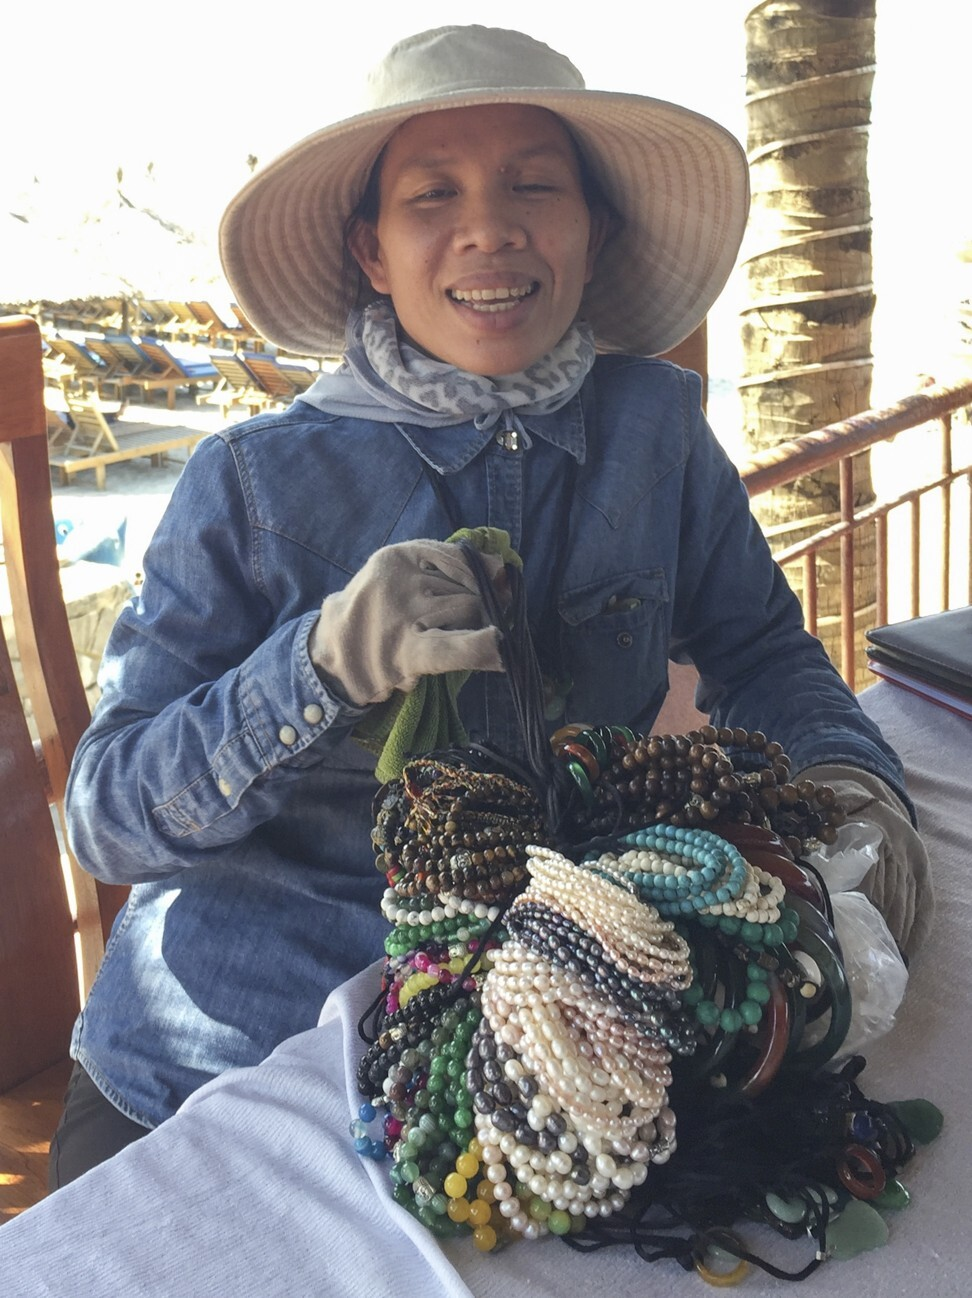 Bracelet seller Pham Thi Thu Xiem has returned to work at An Bang Beach in Hoi An. Photo: Patrick Scott